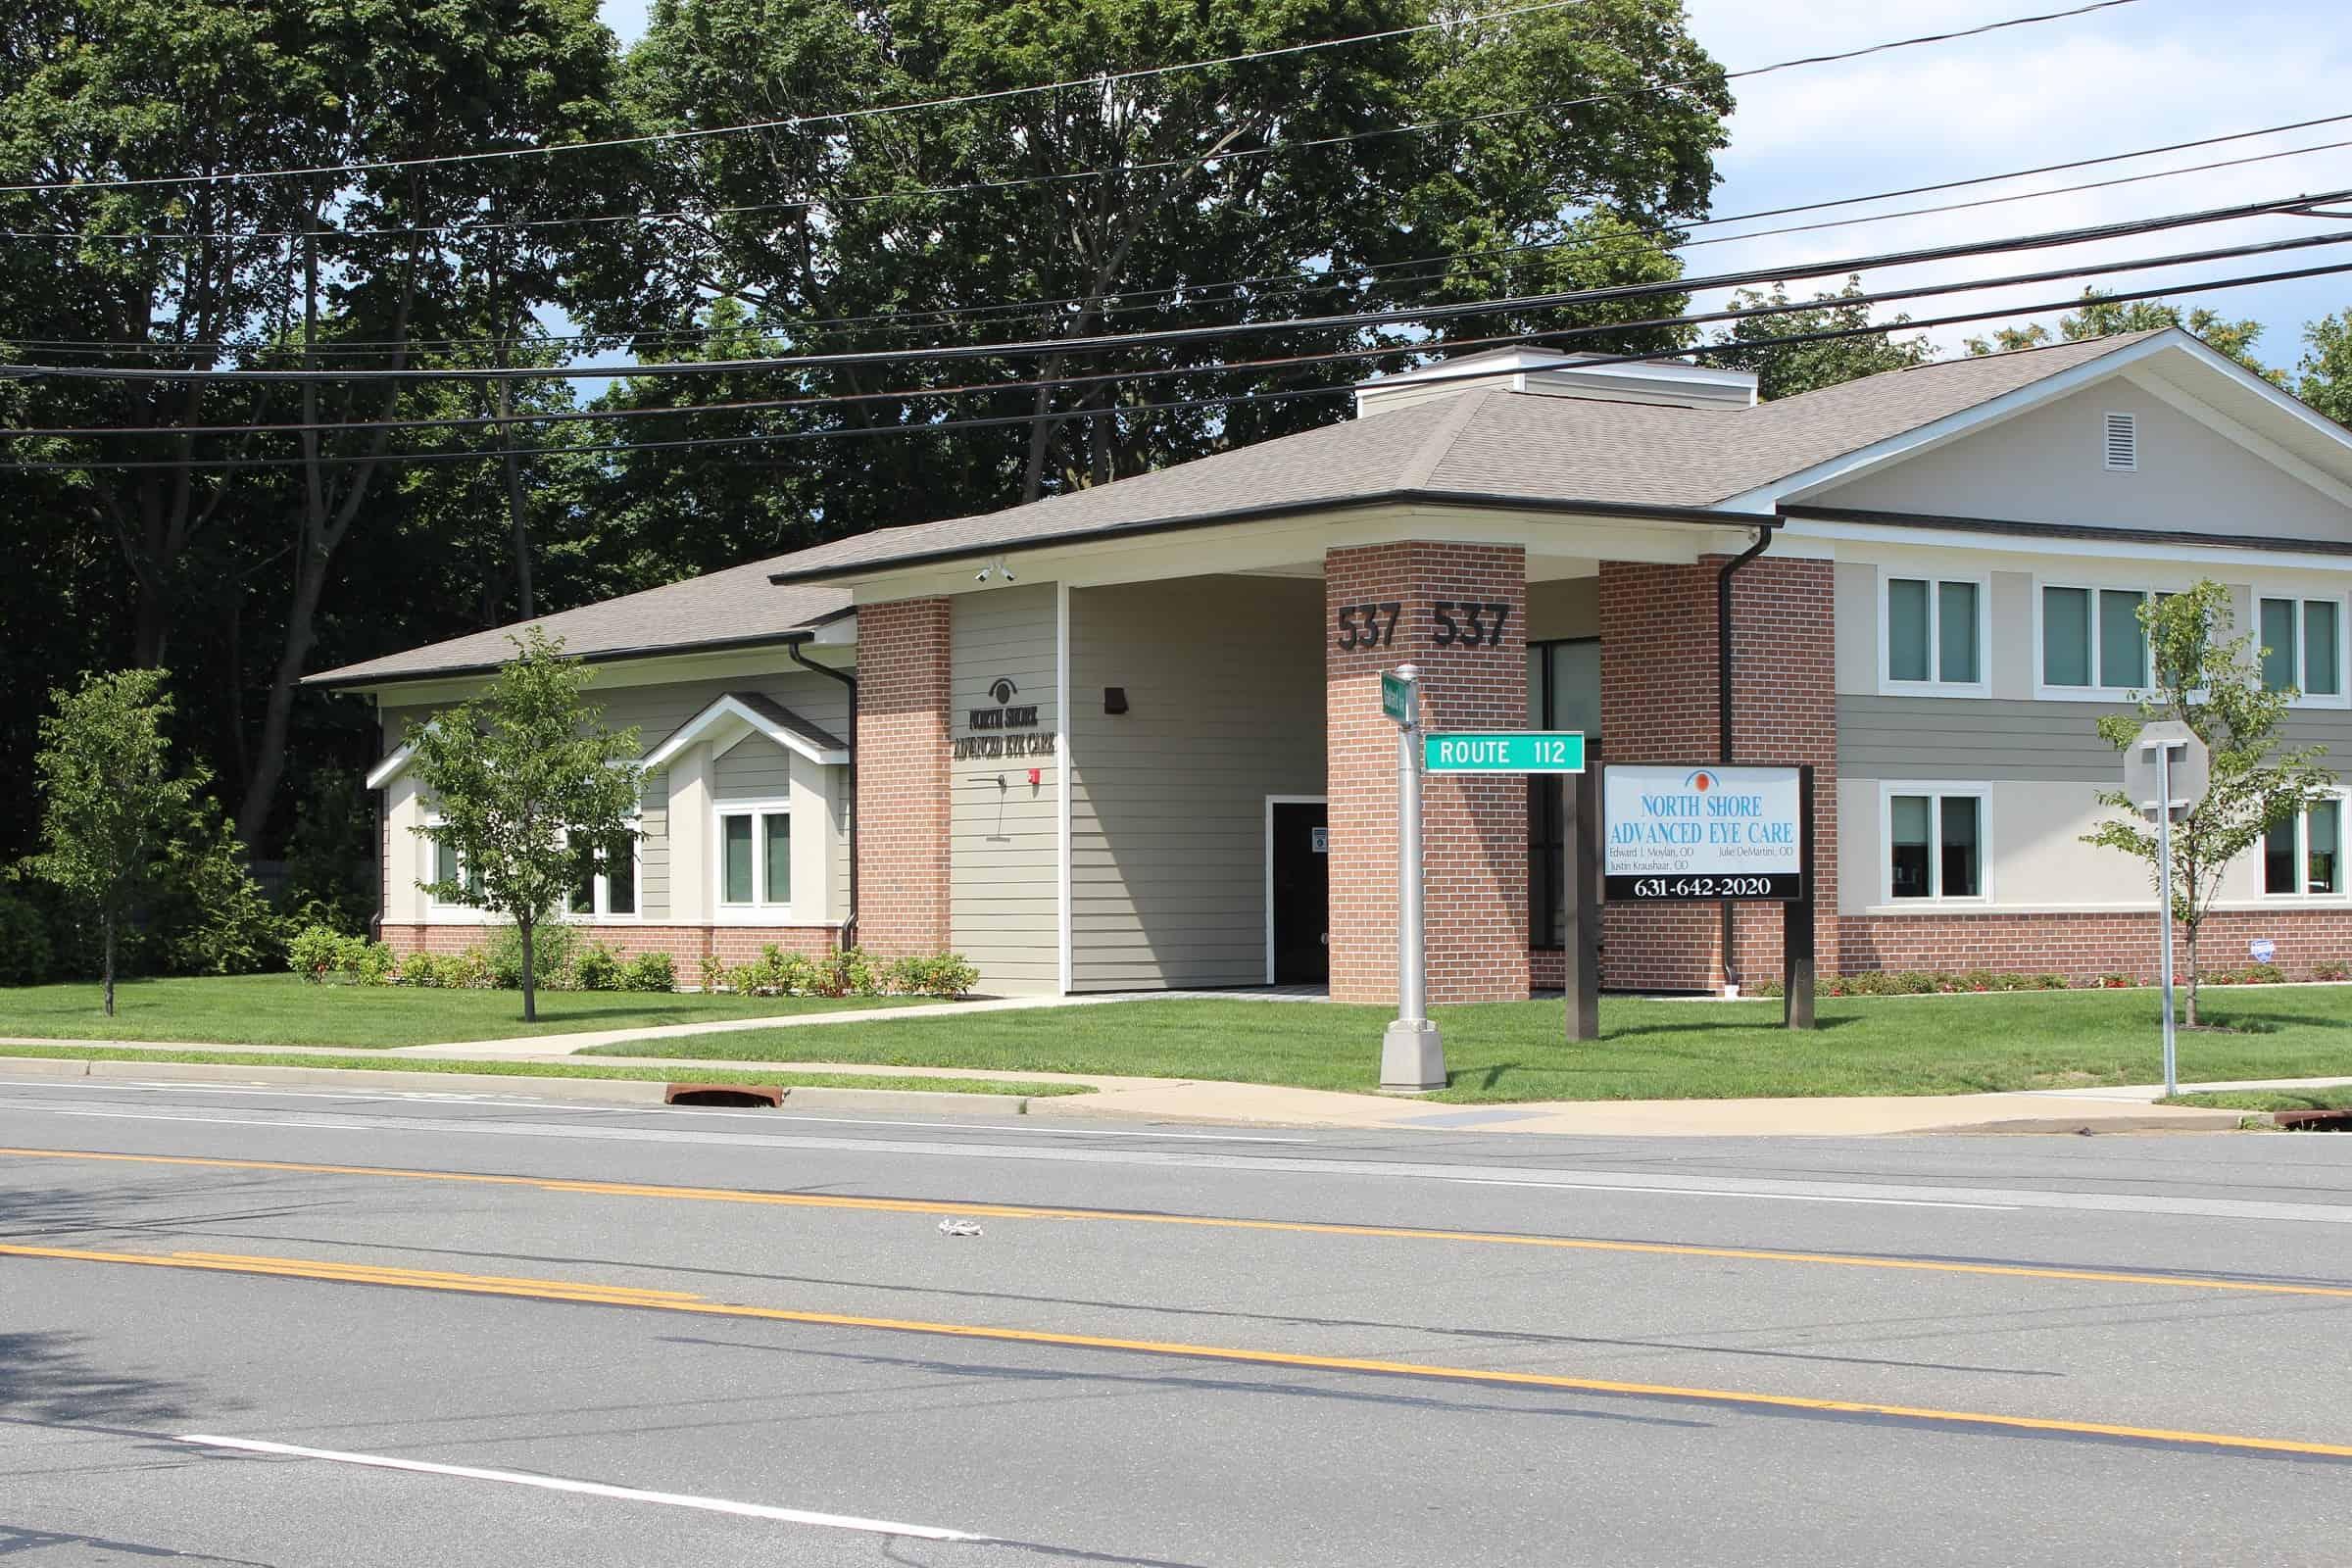 537 Patchogue Rd Port Jeff Station, Ny 11776 - Eye Doctor